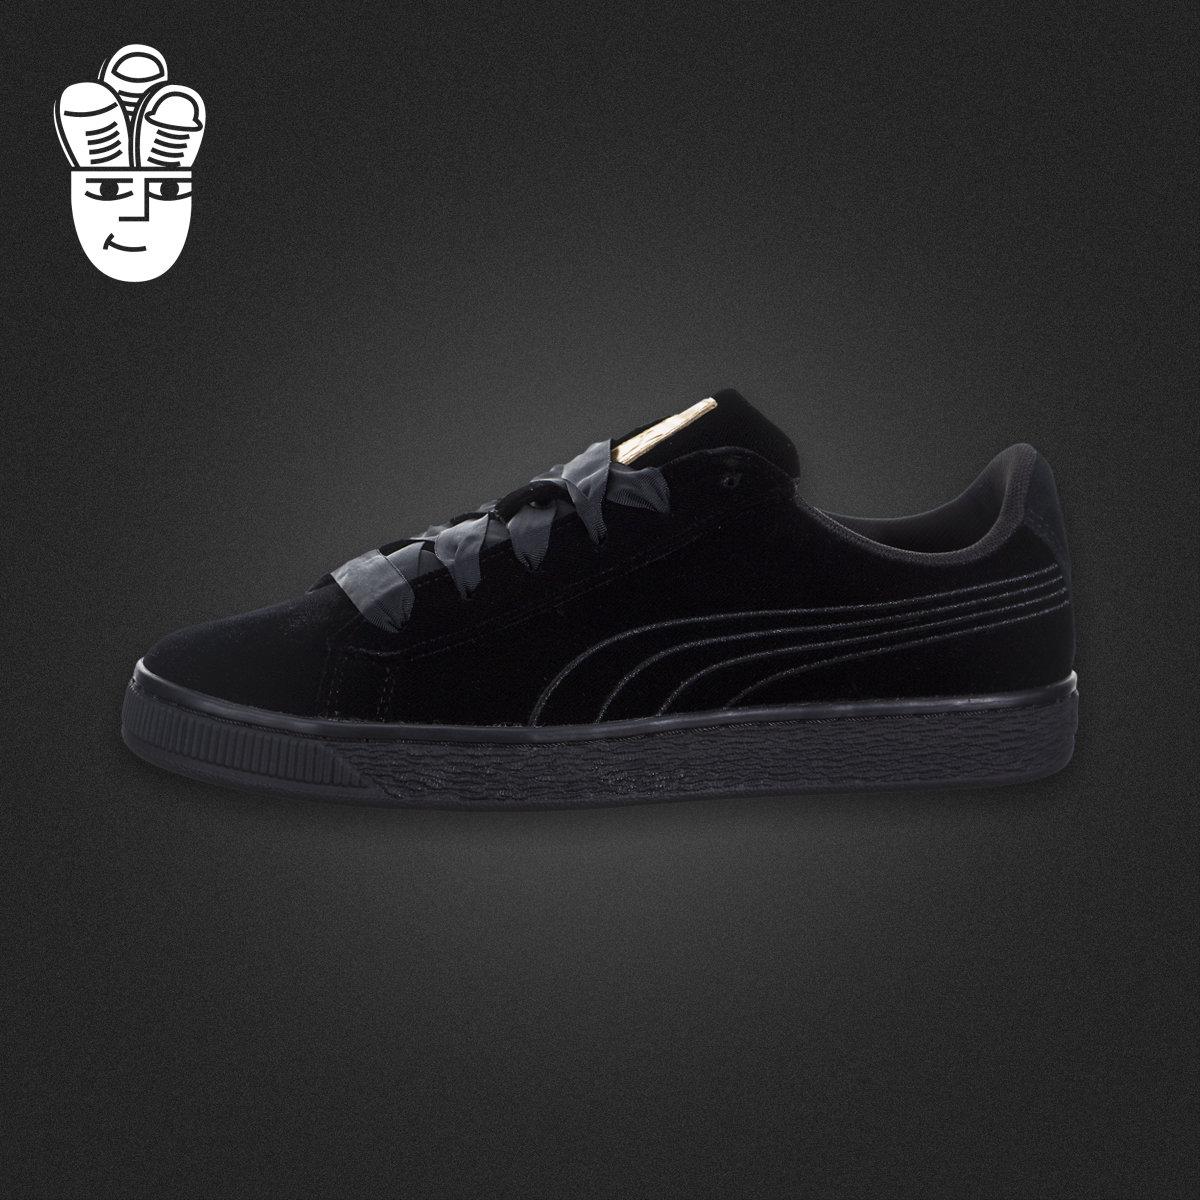 Puma Basket Classic 彪马男鞋女鞋GS 低帮复古板鞋 运动休闲鞋